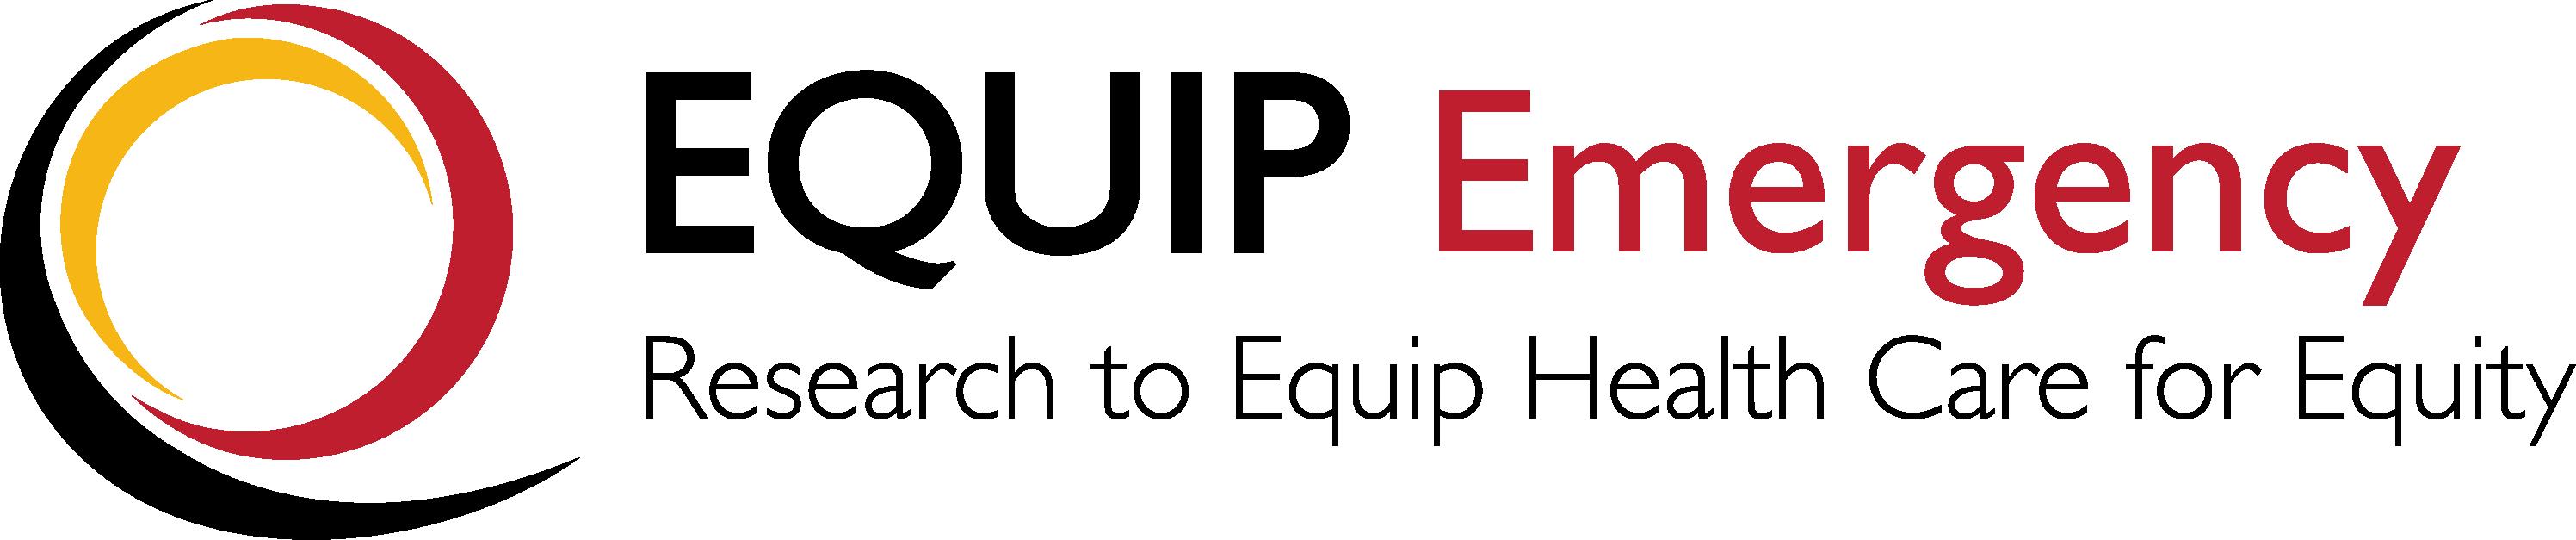 Equip Emergency